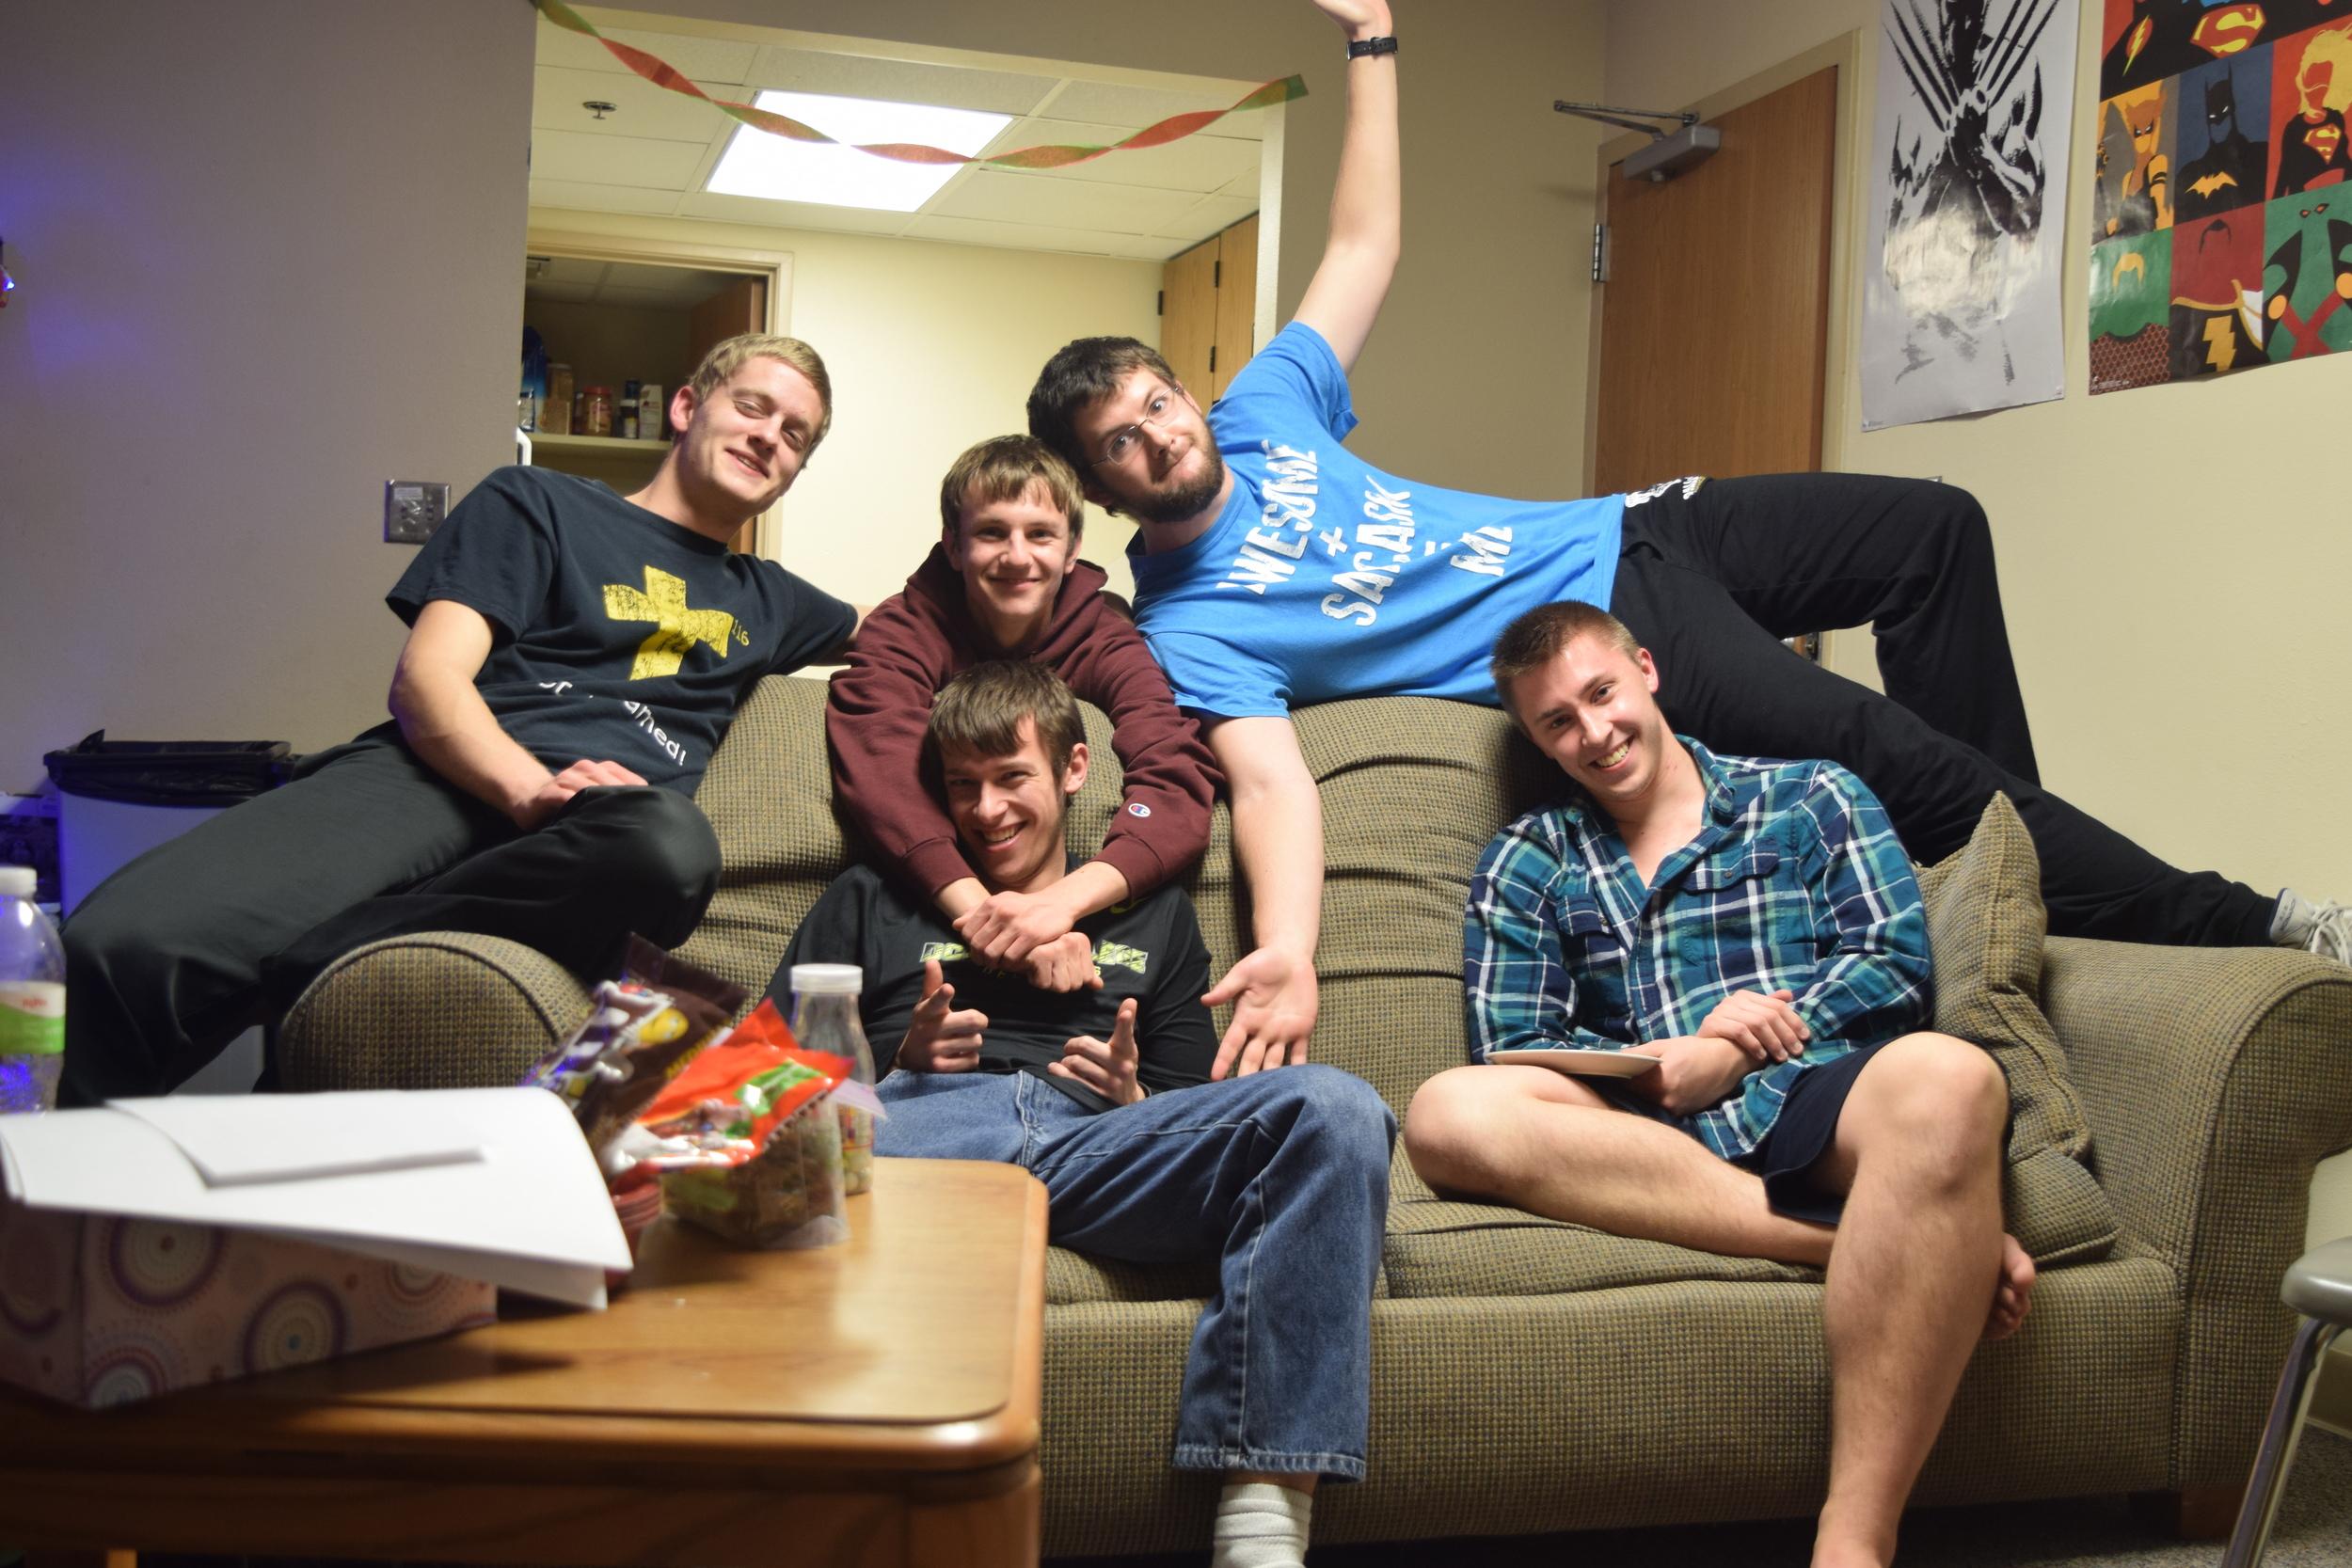 A Bunch of Weirdos AKA my roommates. Top: Nathan, Ben, Josh. Bottom: Andrew, Mark.